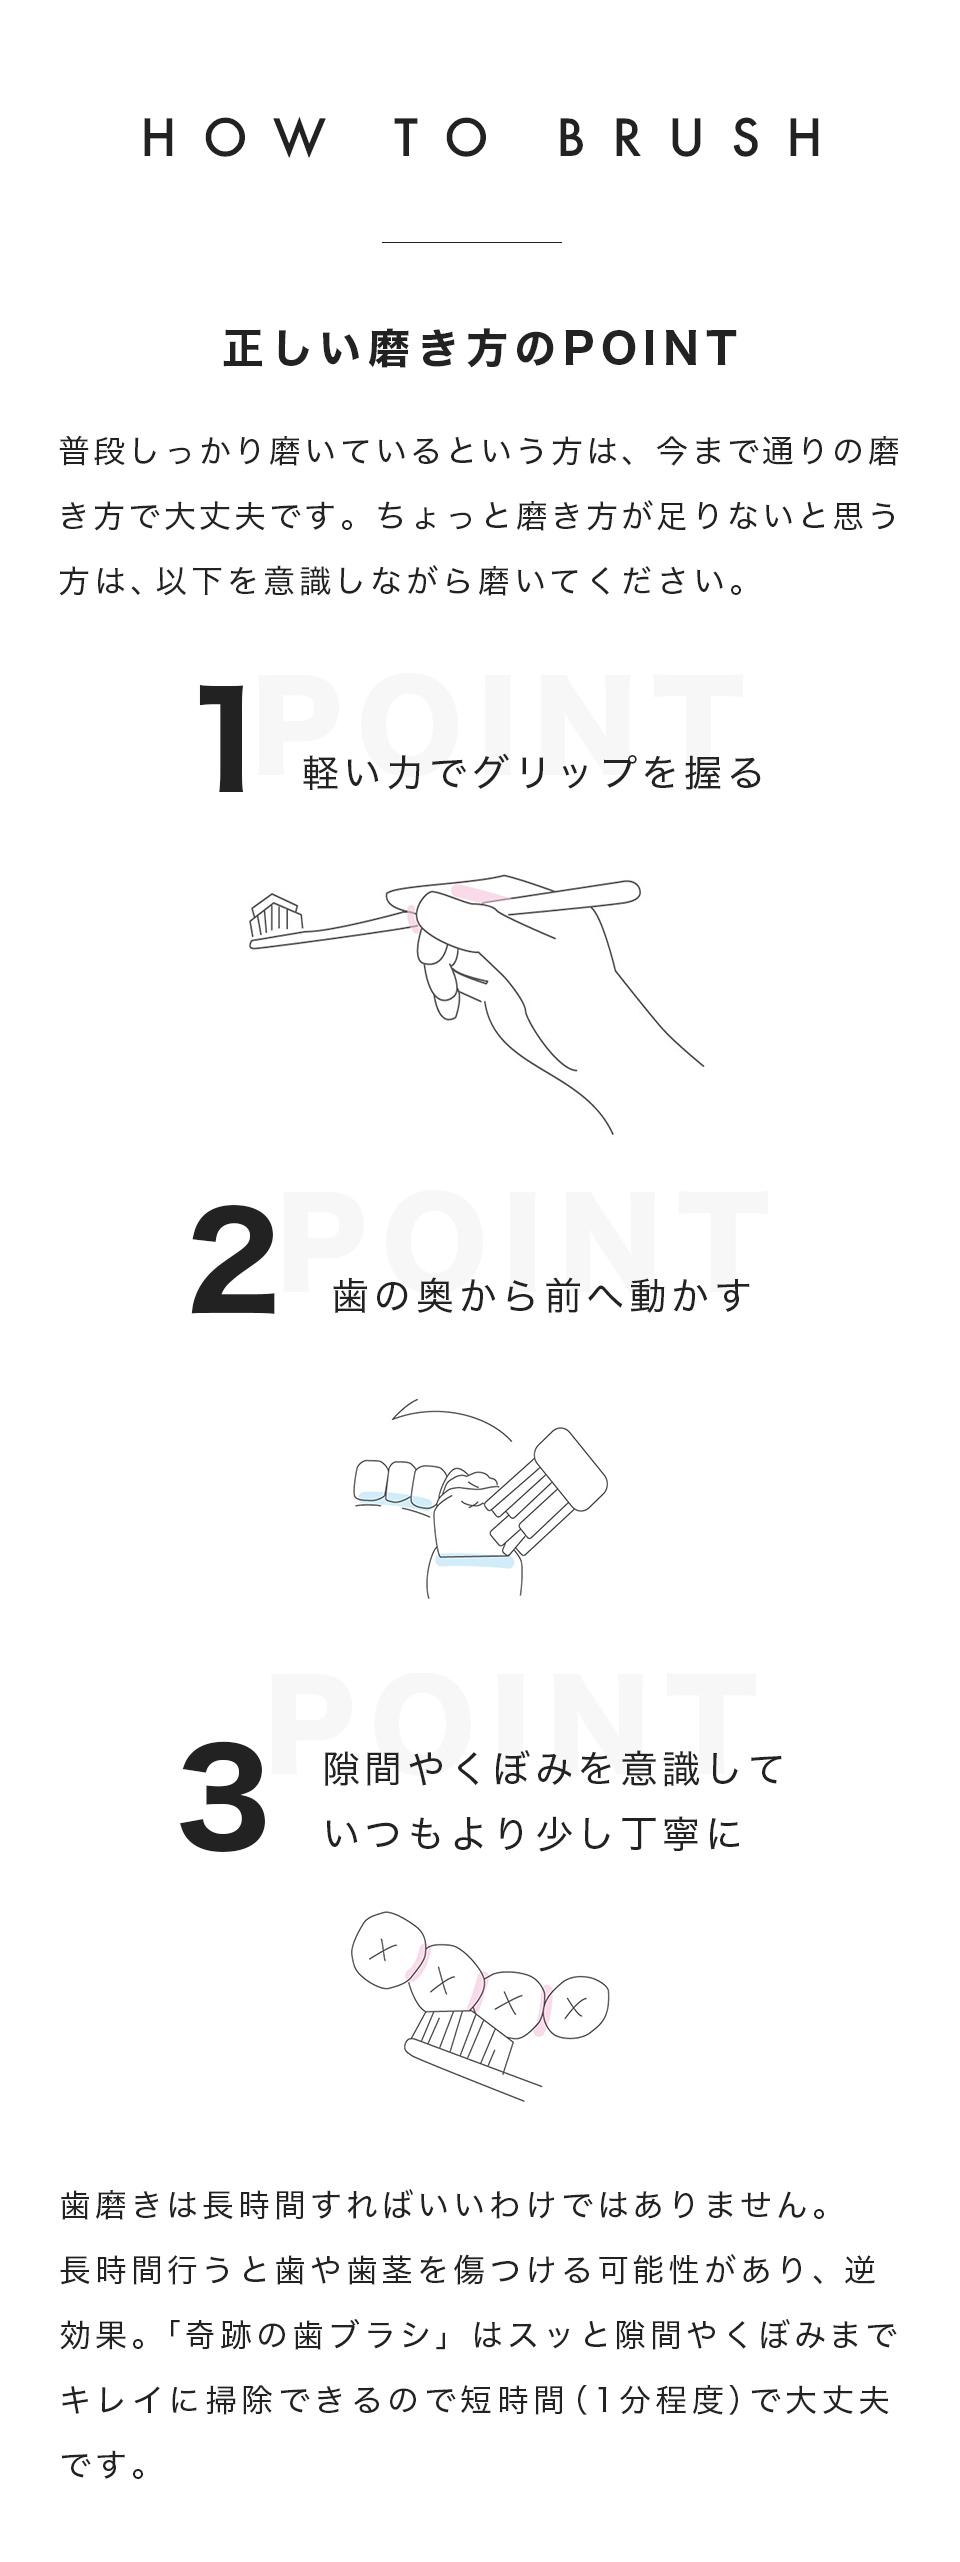 HOW TO 正しい磨き方のポイント